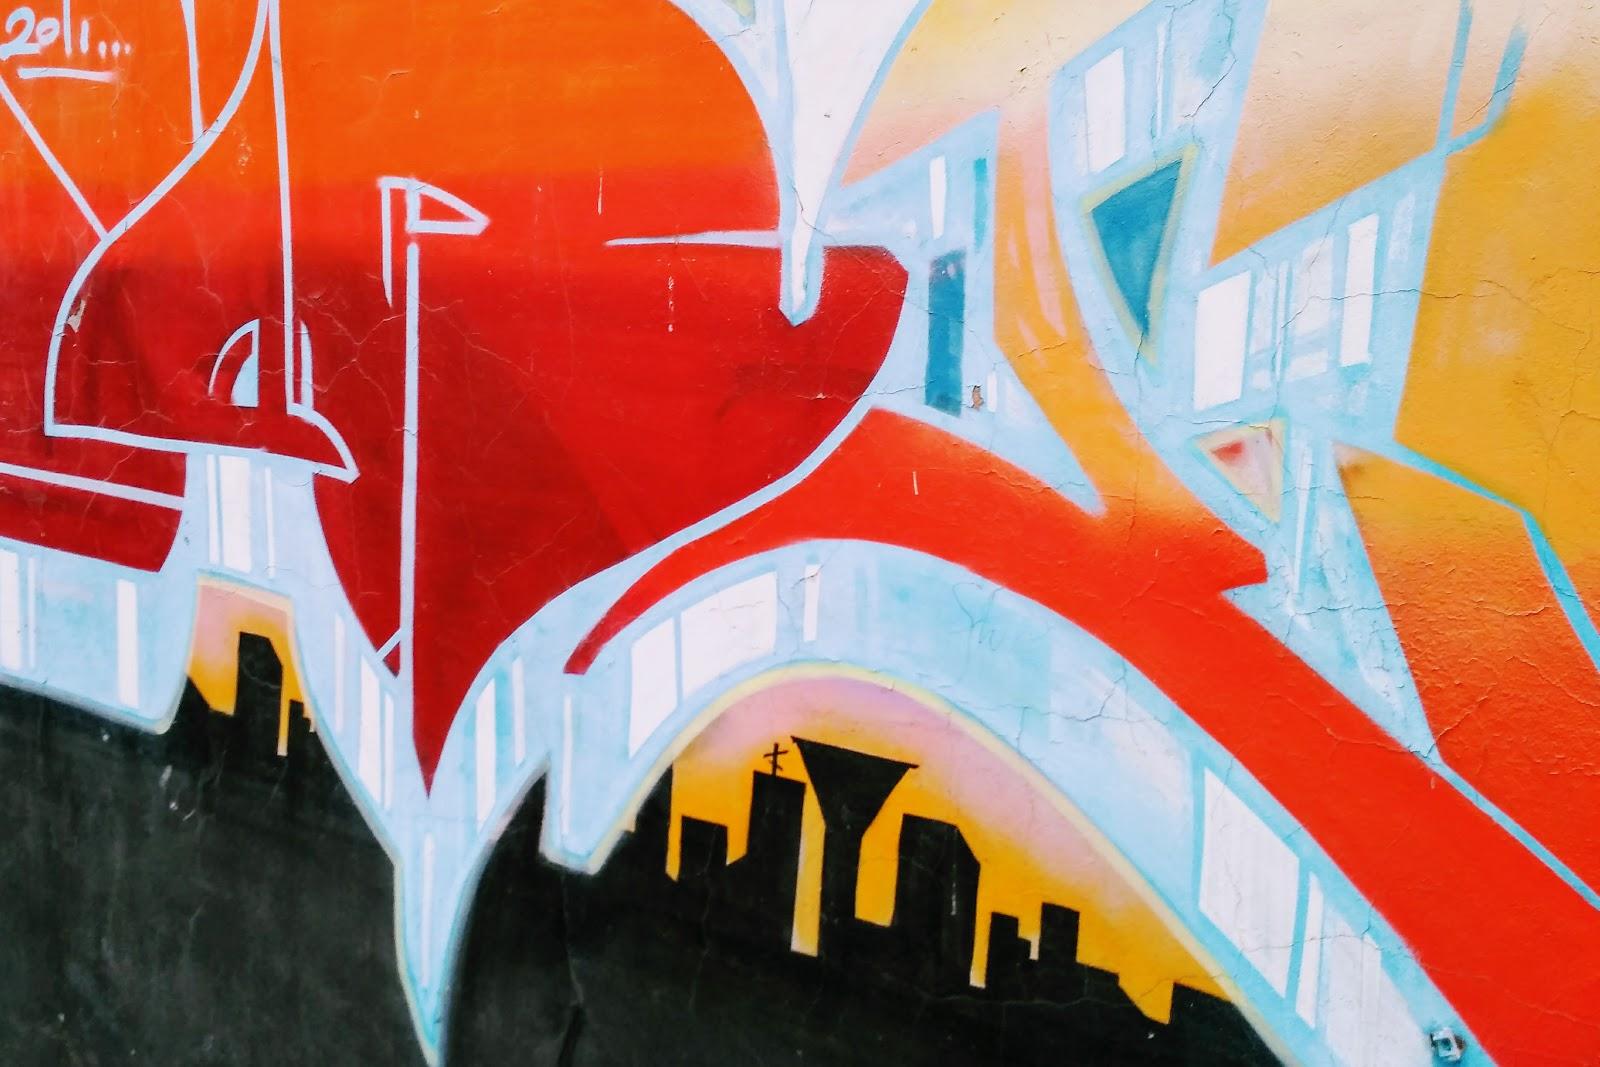 Lubin mural rynek